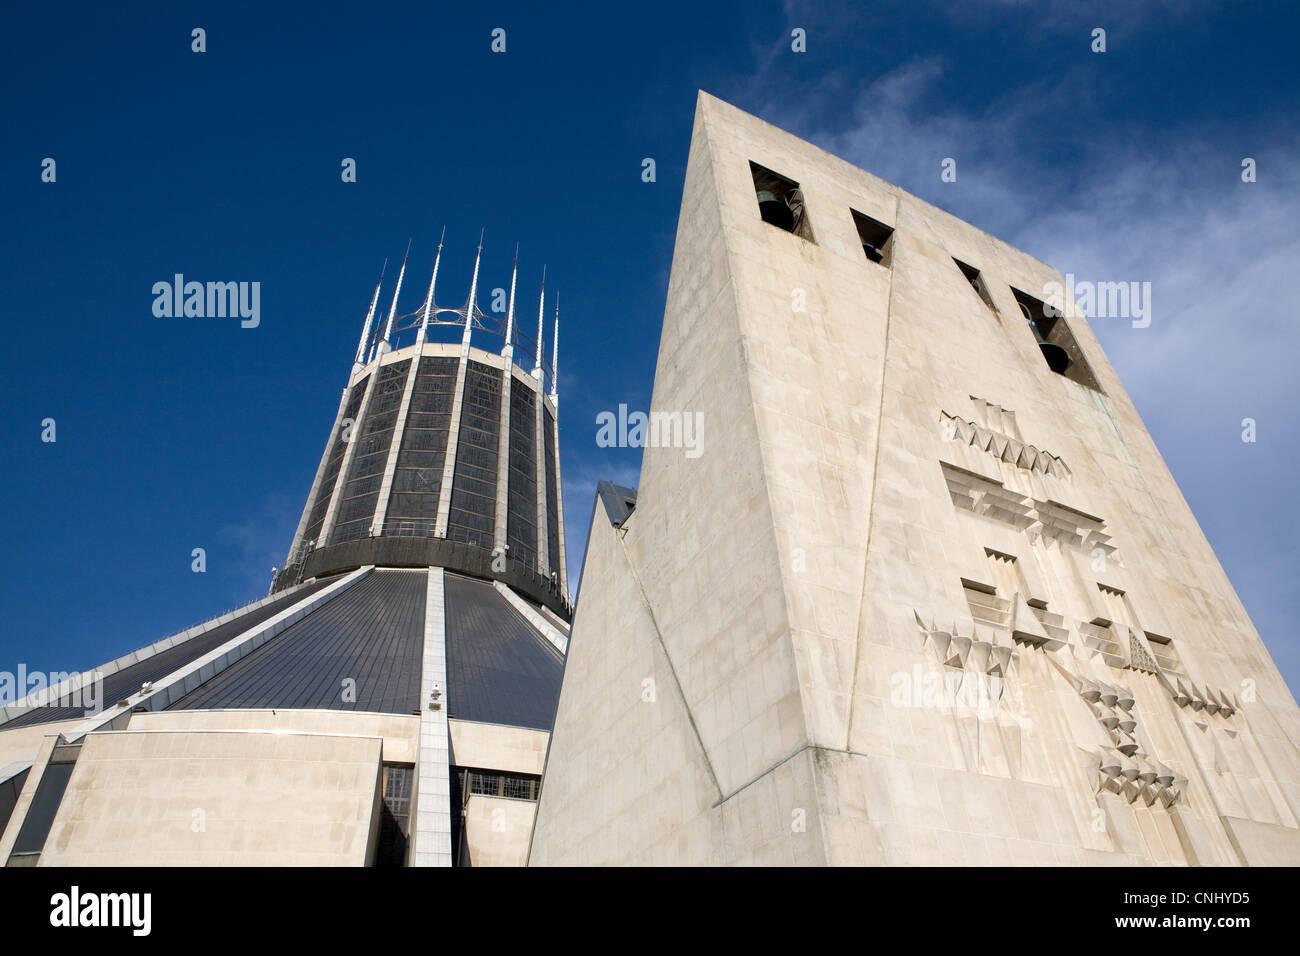 Liverpool Metropolitan Cathedral, Liverpool, UK - Stock Image